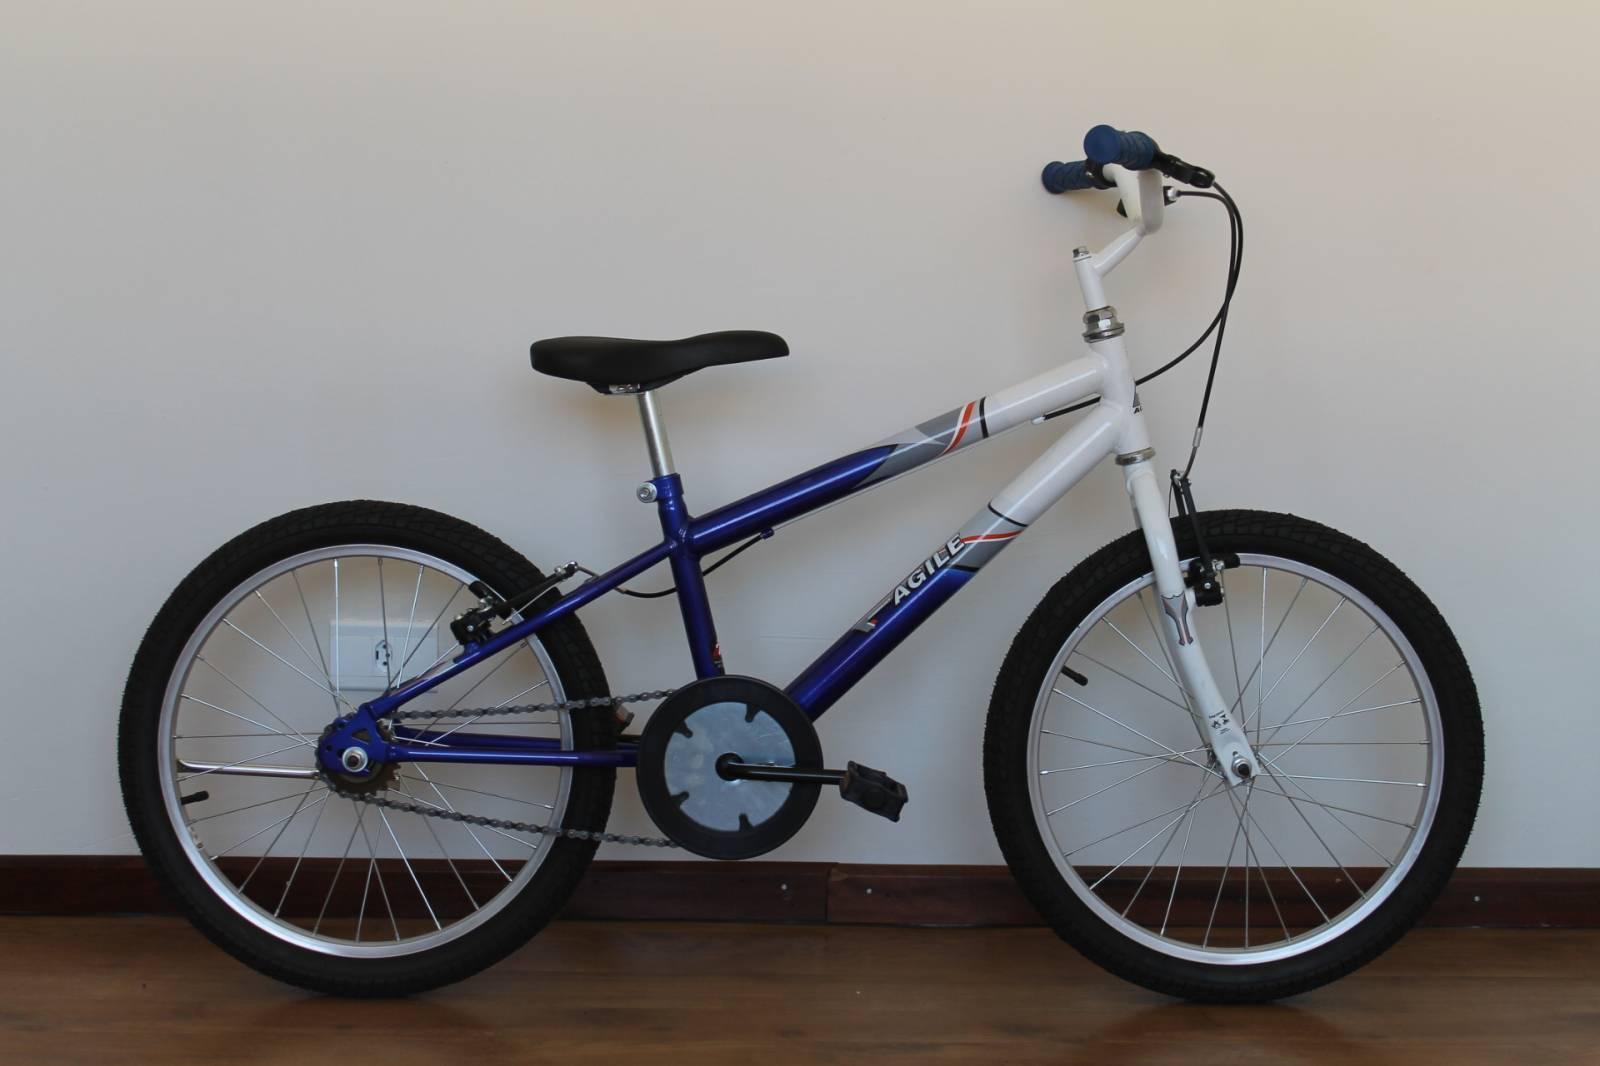 Bicicleta Agile  Aro 20 Modelos - Bike Portella